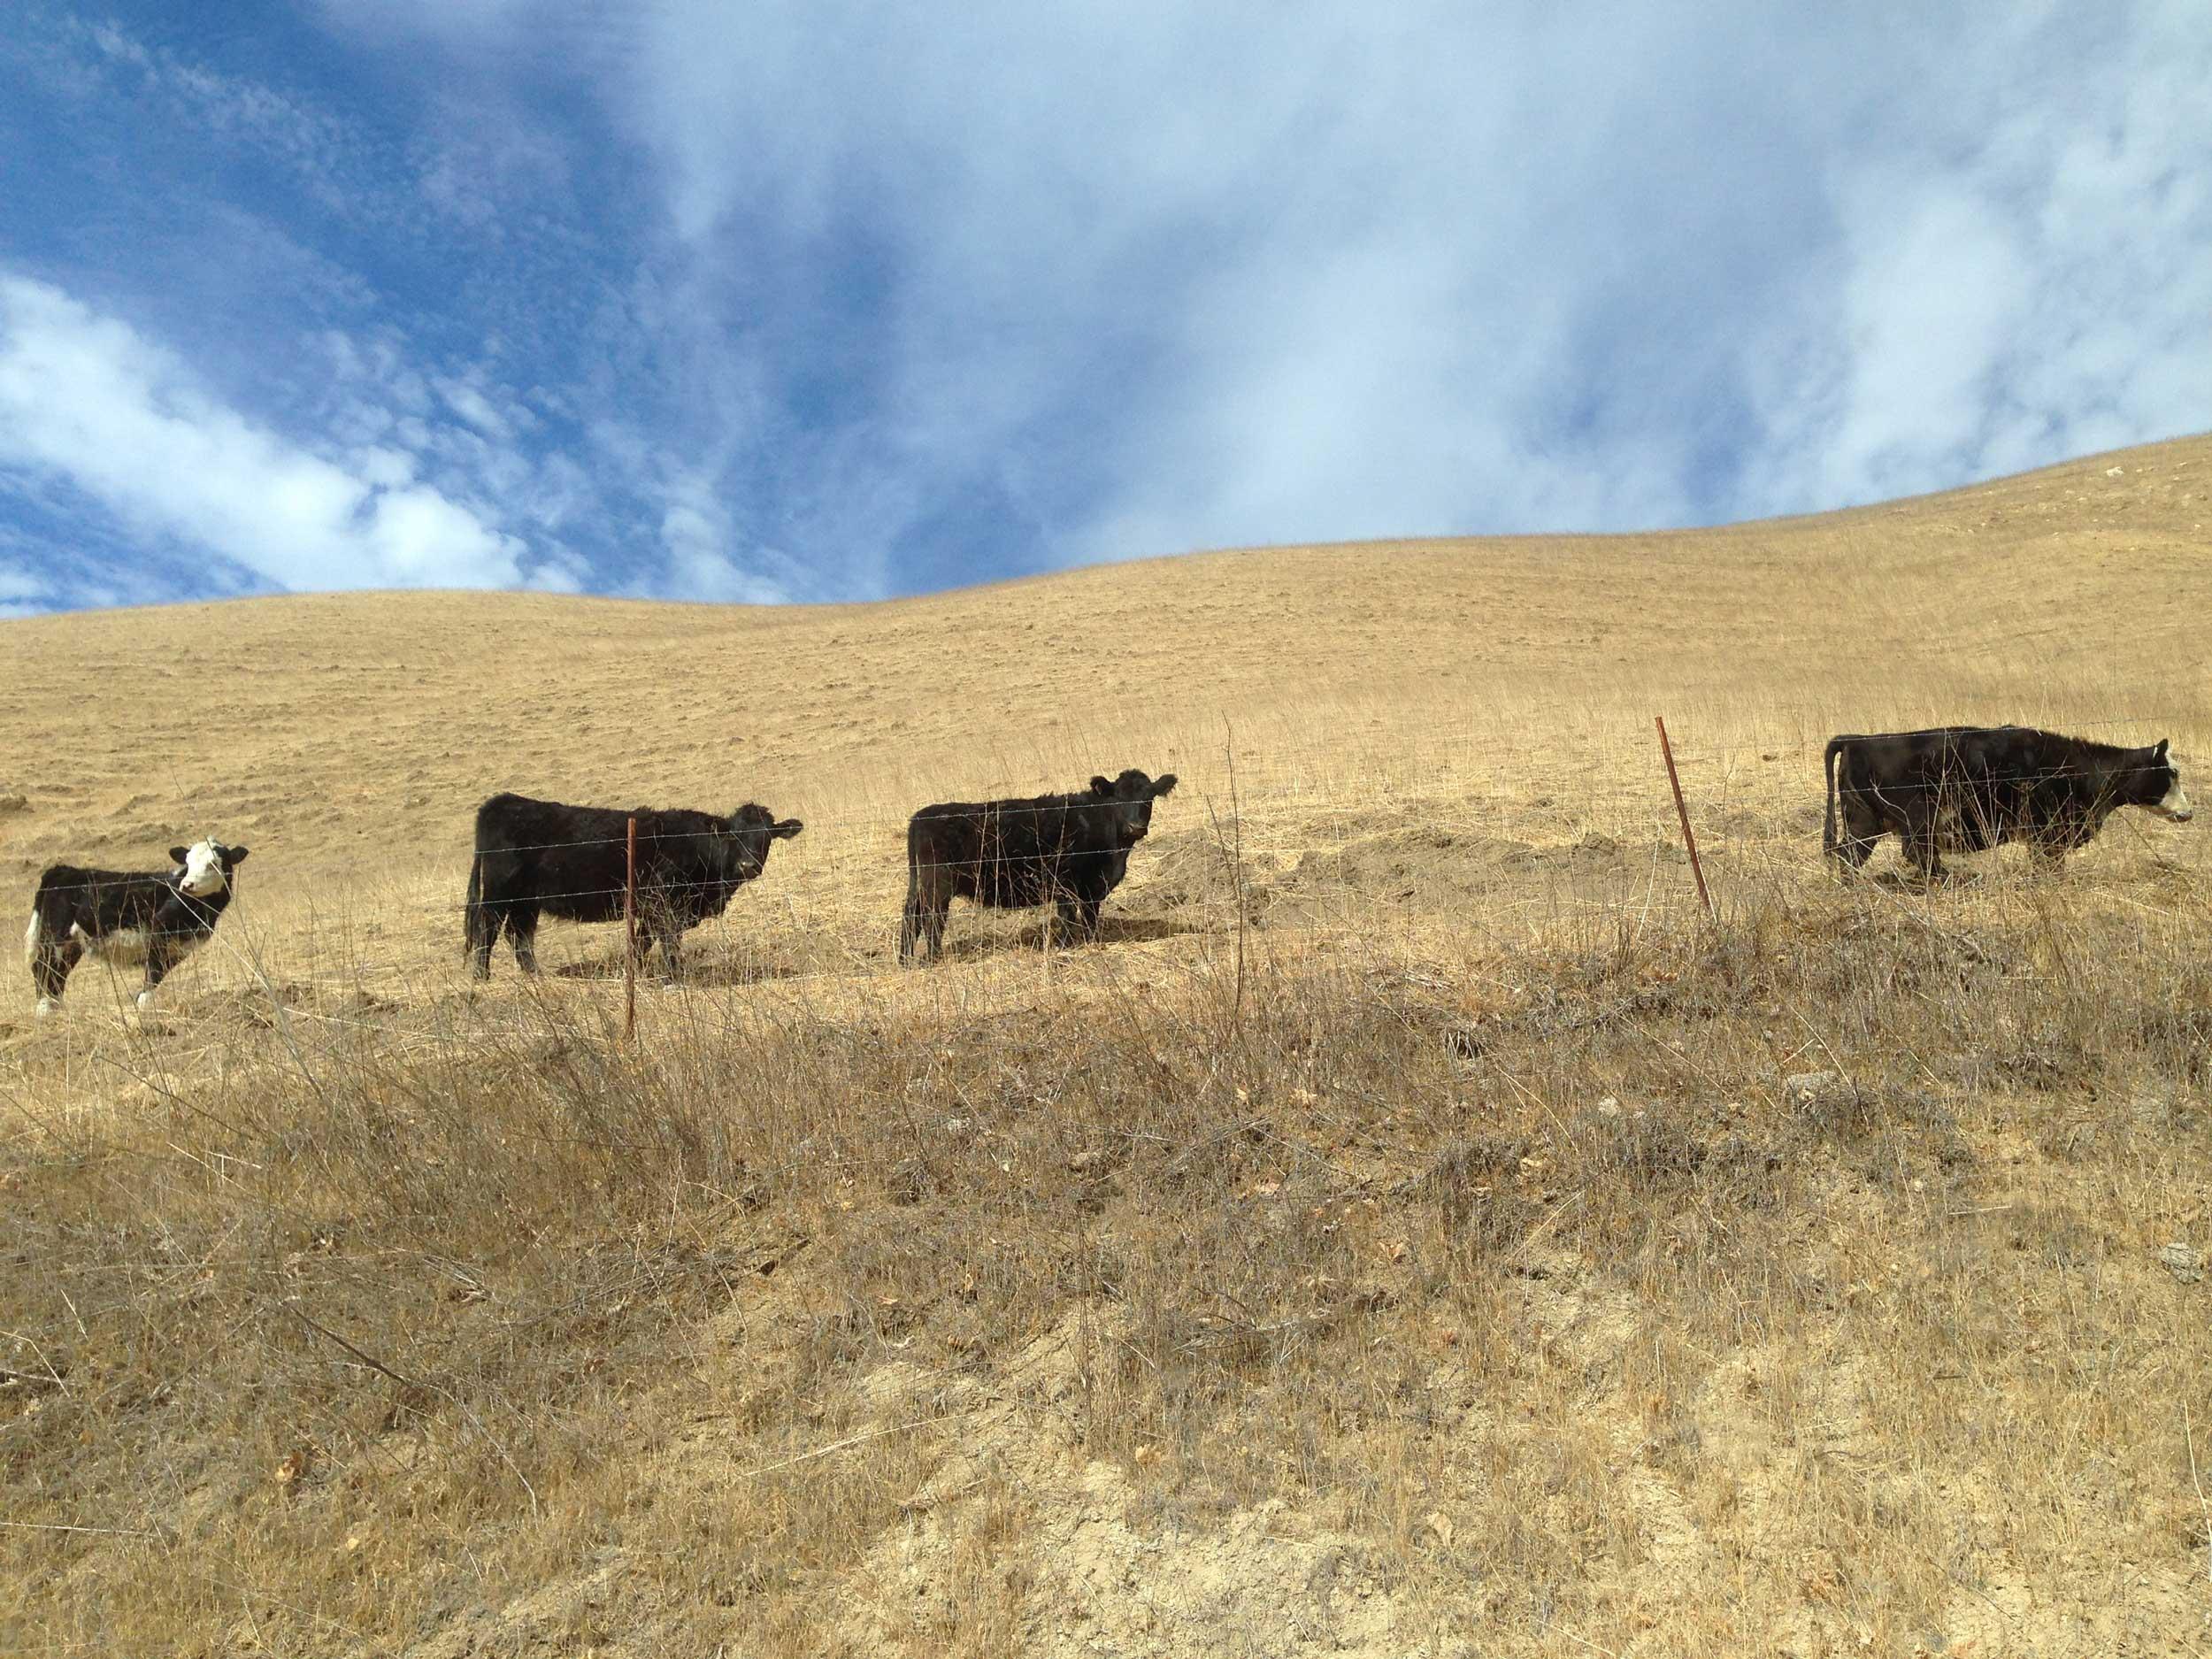 Some of the few remaining cattle in Bob Blanchard's Old Creek Ranch heard graze on a dry hillside.(Alex Blandino/Peninsula Press)